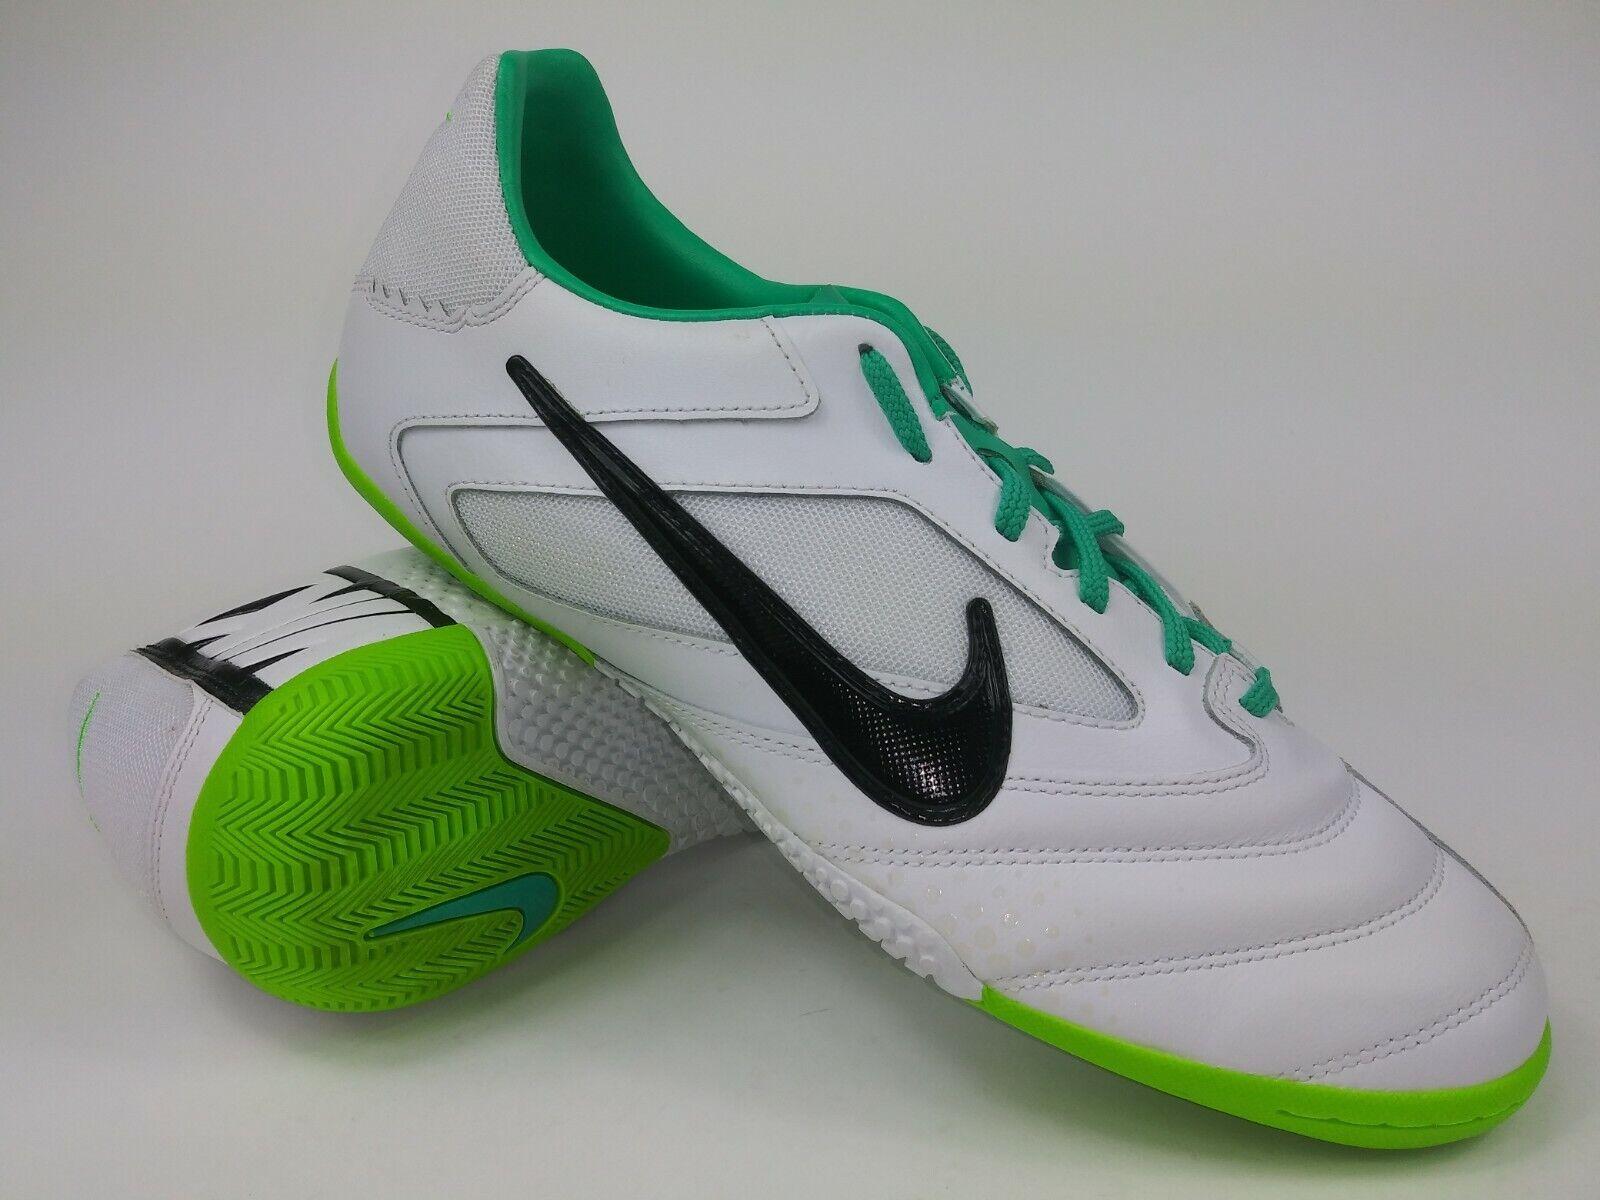 Rare nike 5 elastico pro 415121-103 blanc interior Hommes football chaussures